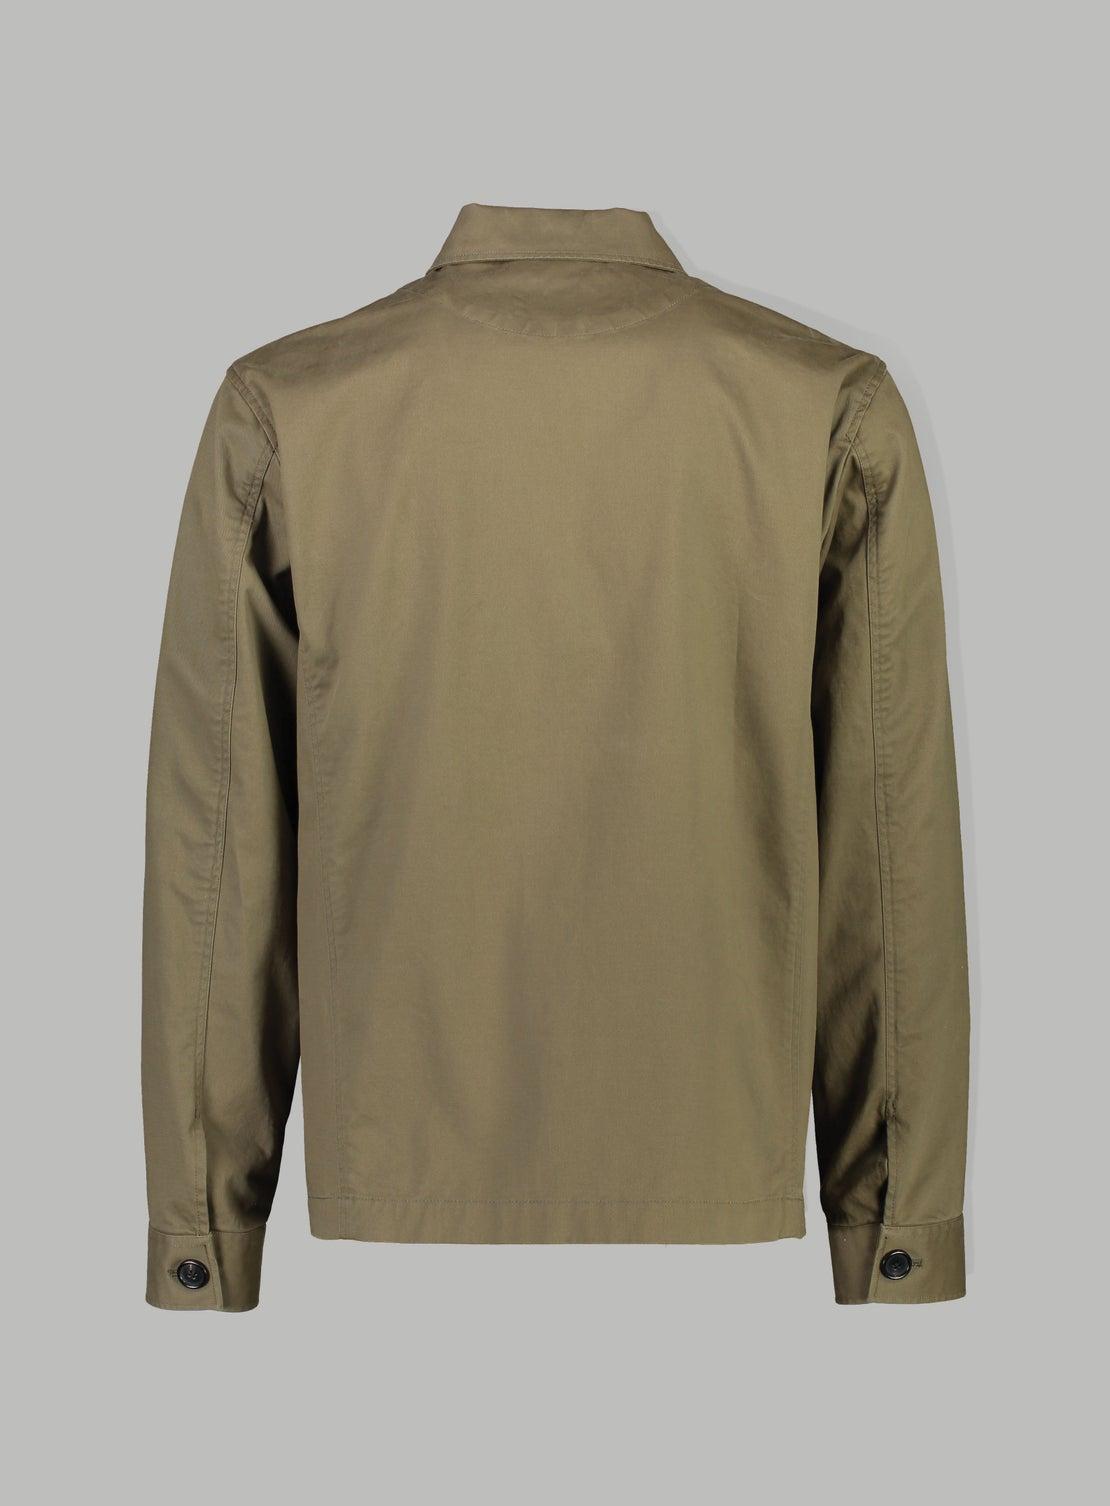 Khaki Green Utility Jacket